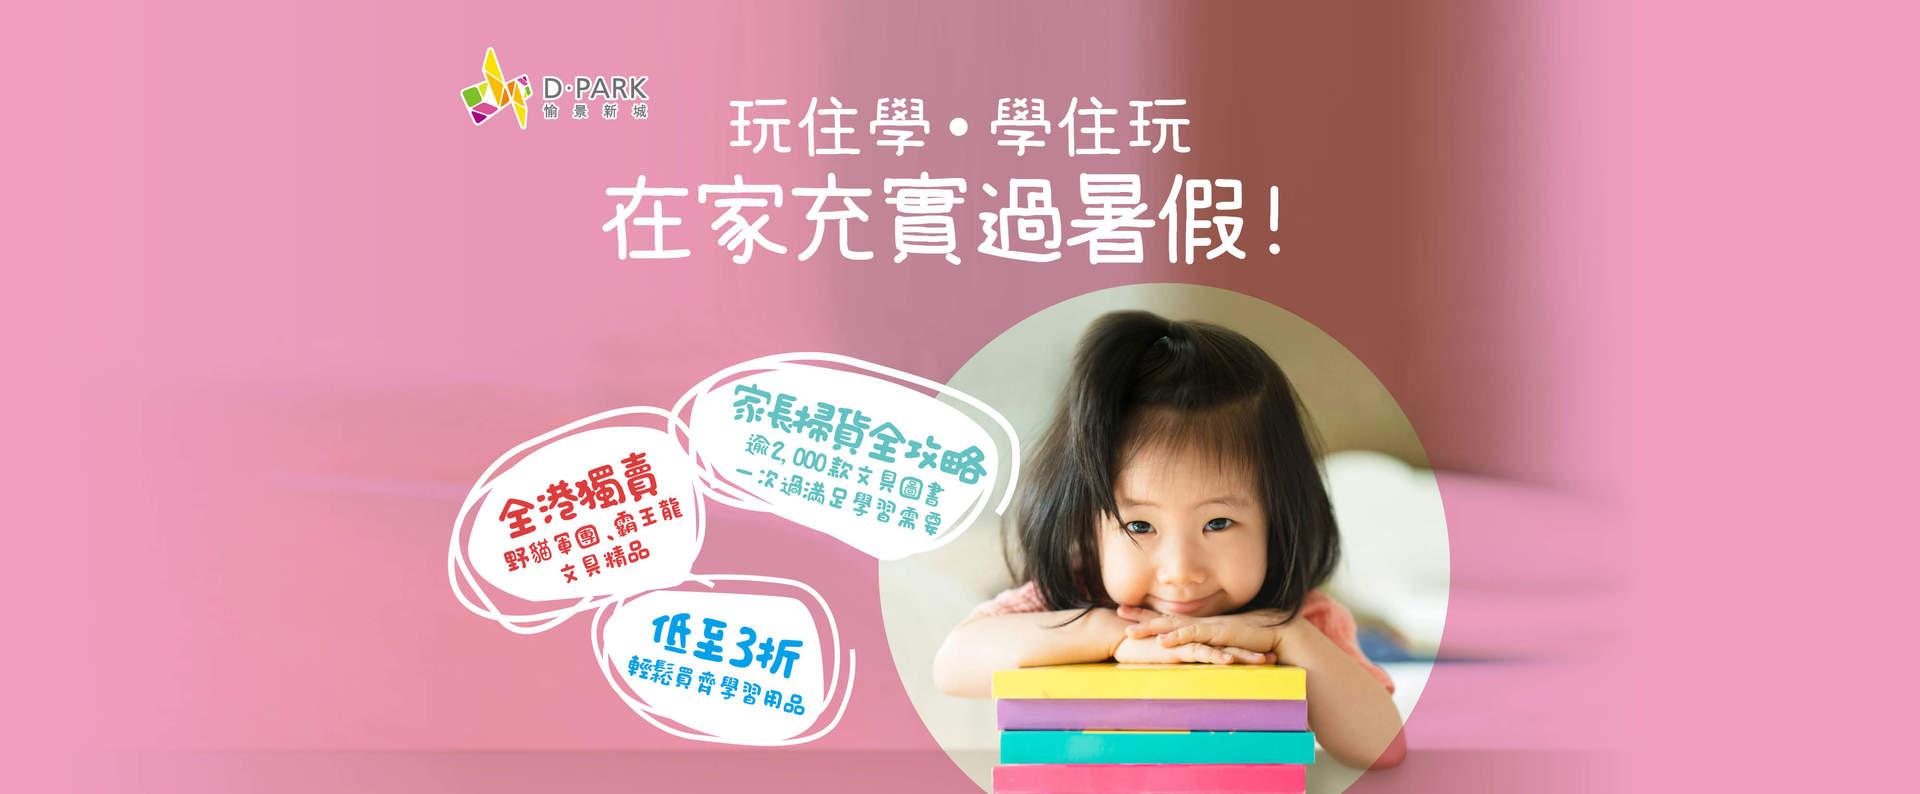 D03 bts 2020 kv web banner1920x794 large